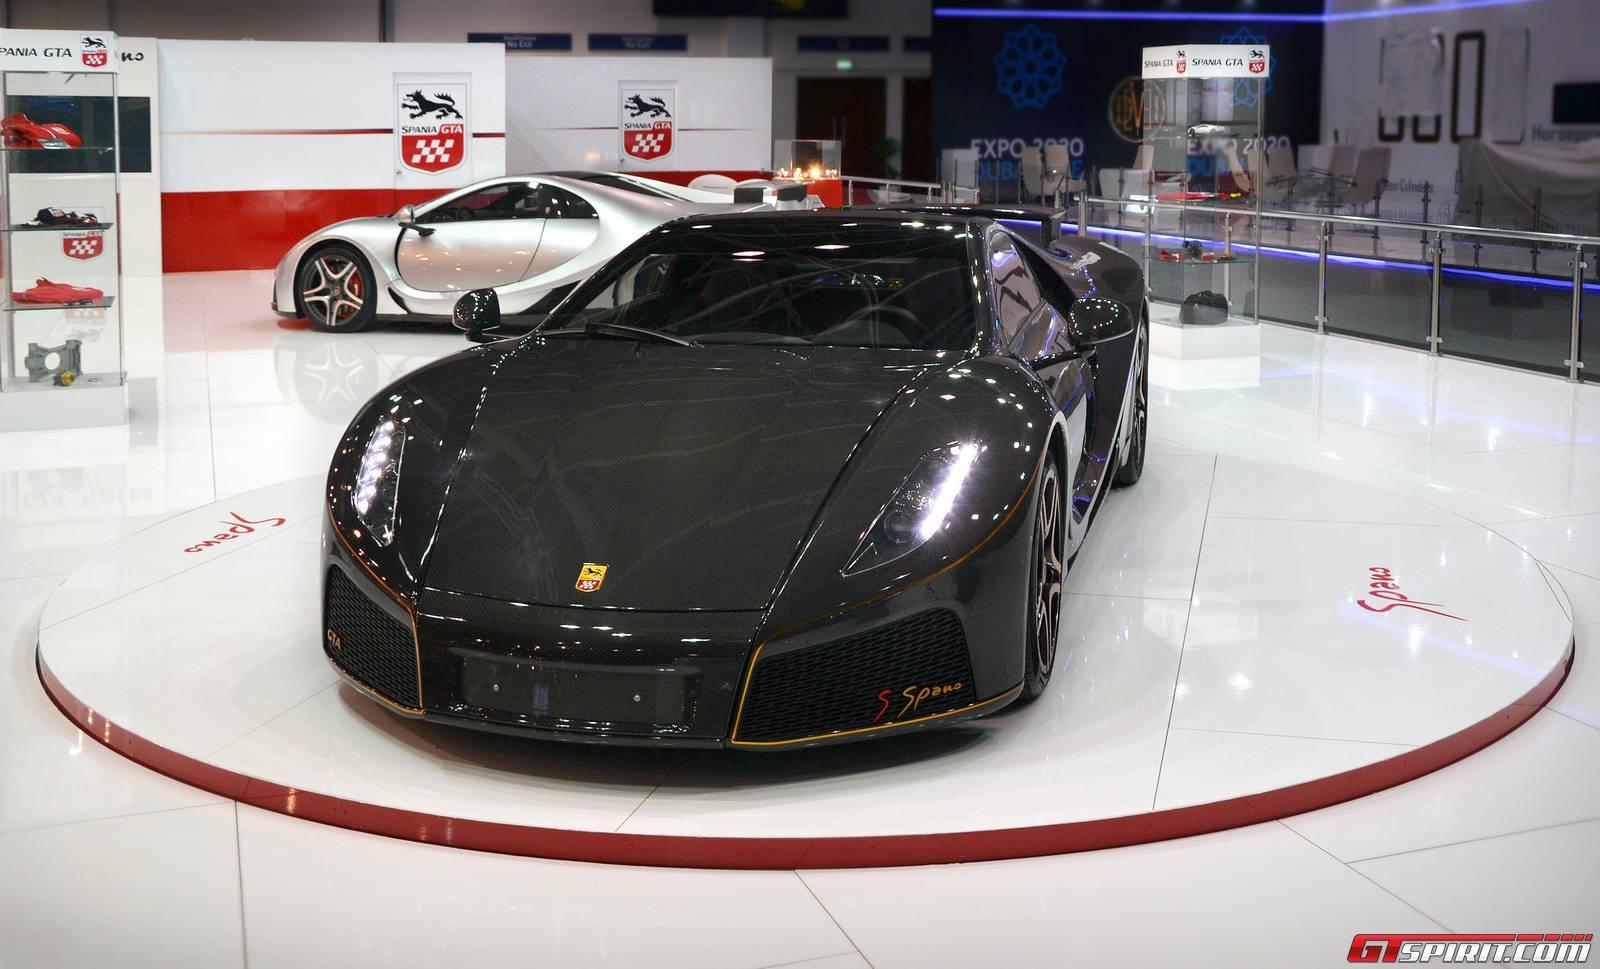 Dubai GTA Spano GTspirit - Car show dubai